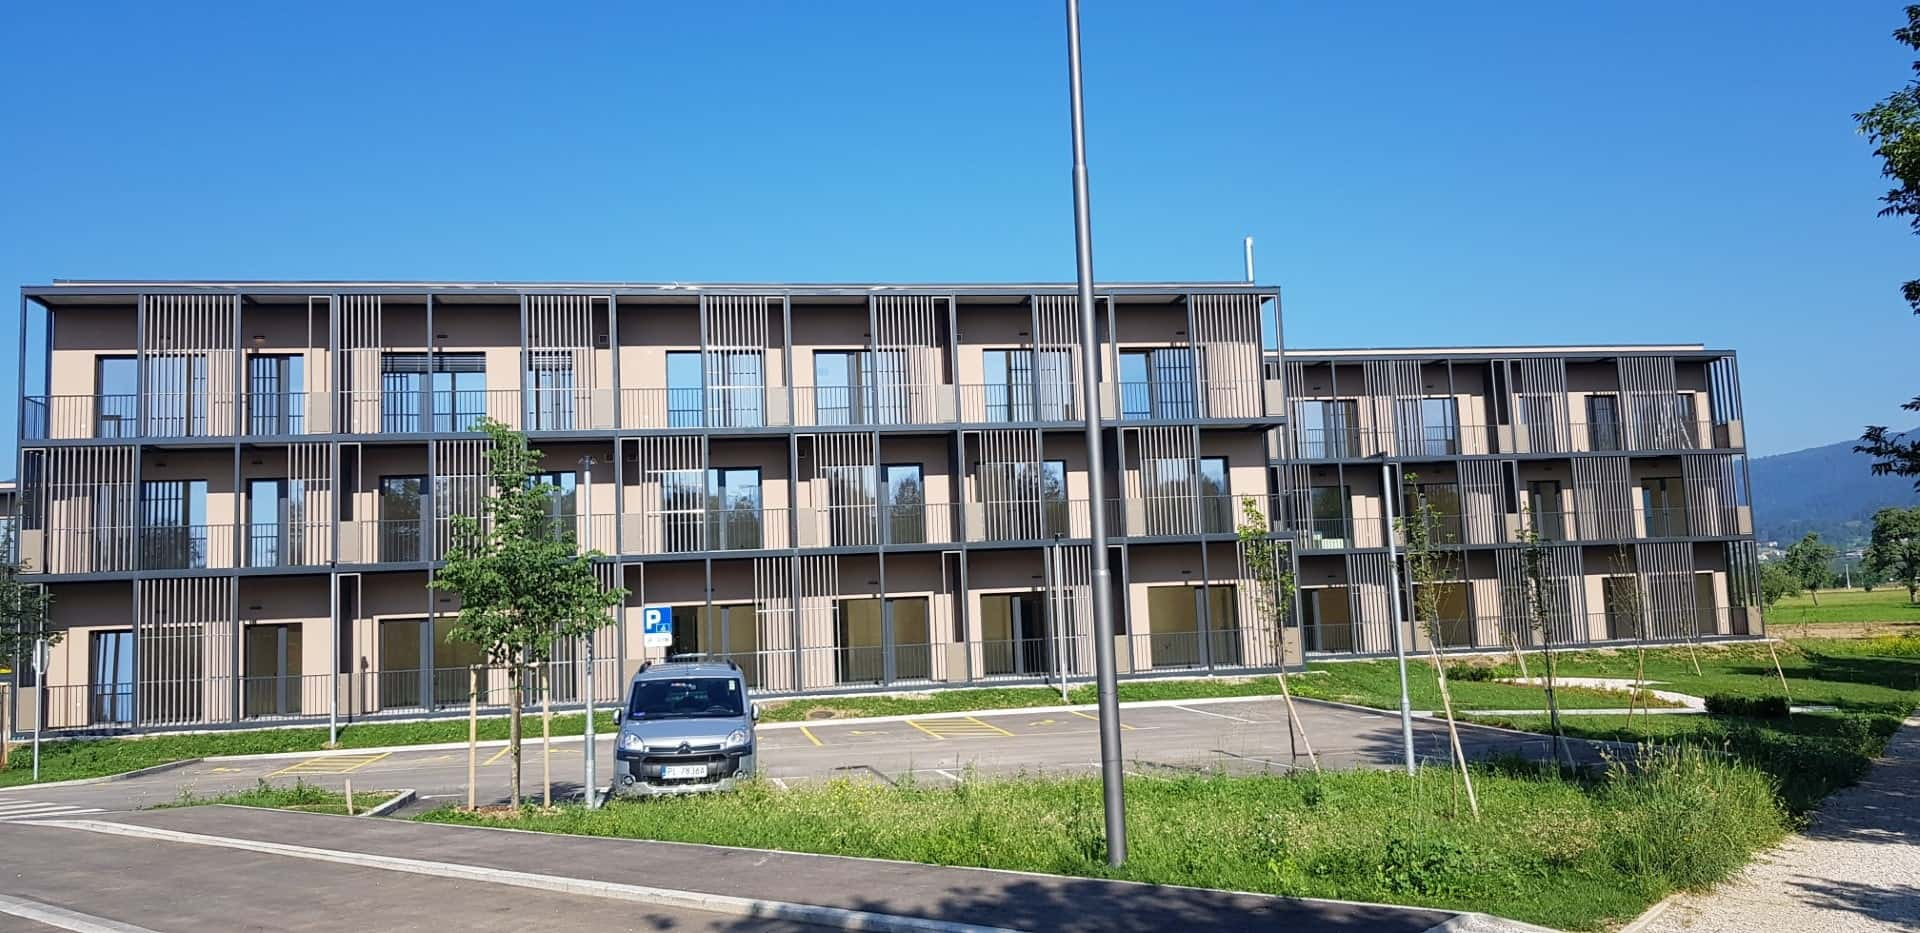 Permal doo reference Varovana stanovanja bled -5 2019 iMode d.o.o. (Large)